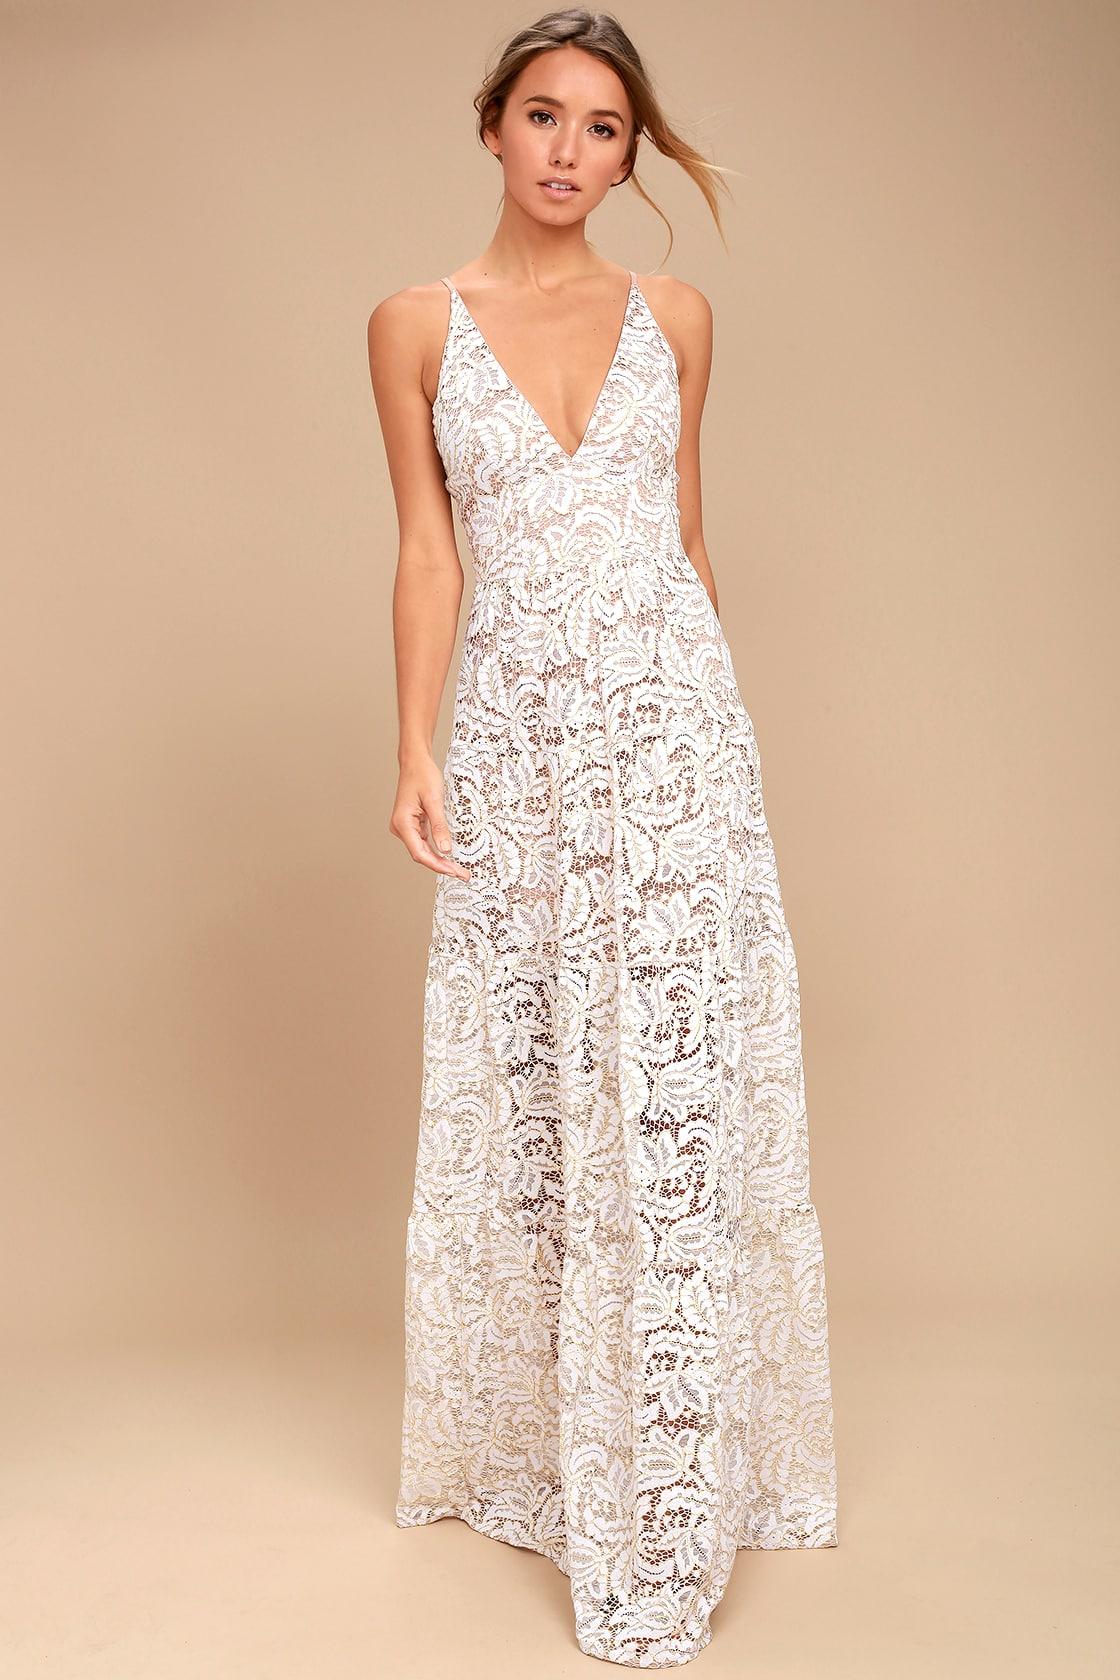 affordable-wedding-dress-13.jpg